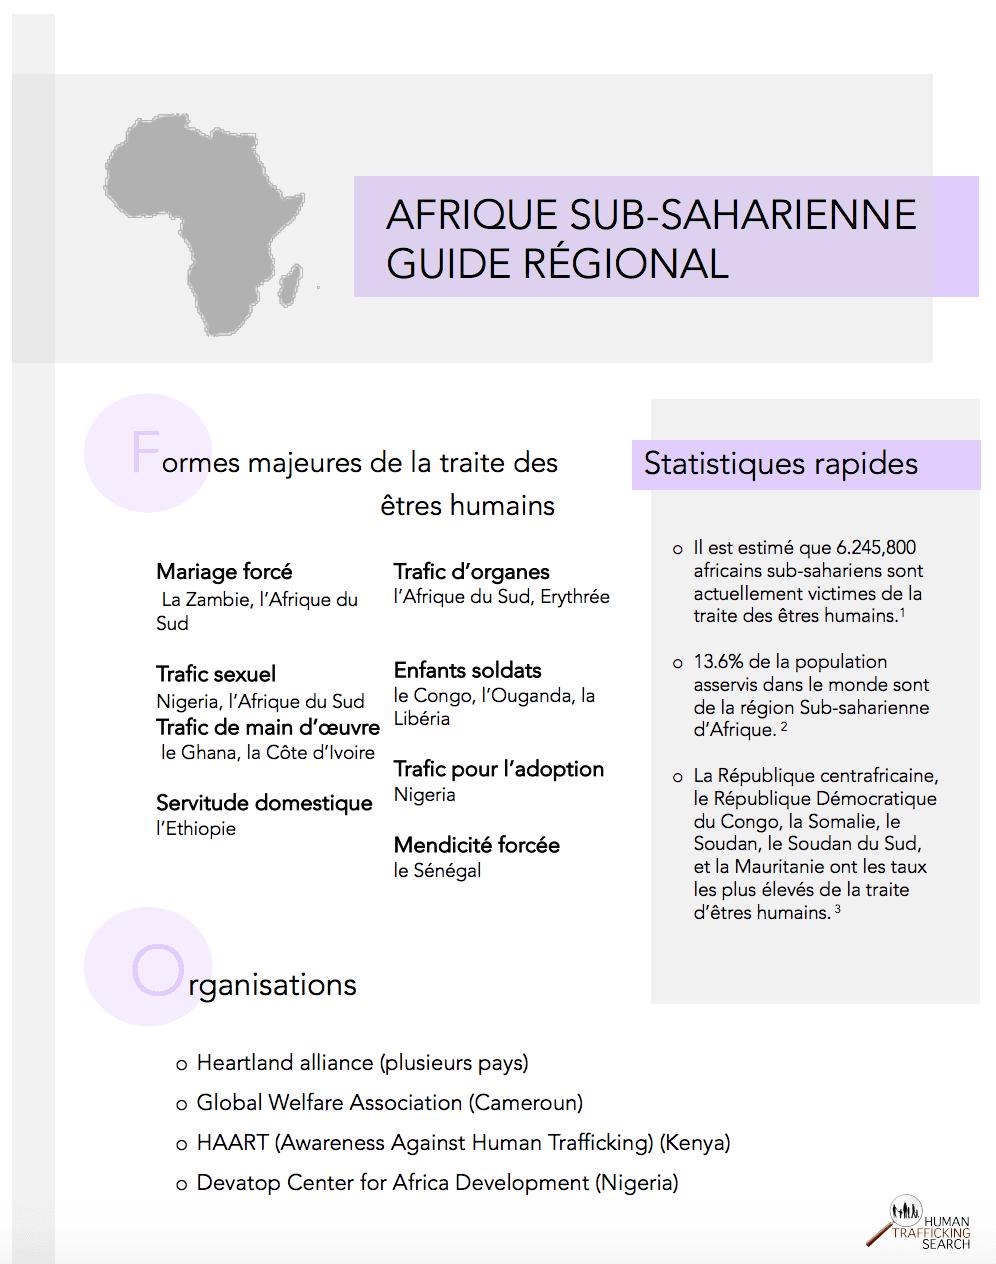 Afrique Sub-Saharienne Guide Regional (FR), 2017